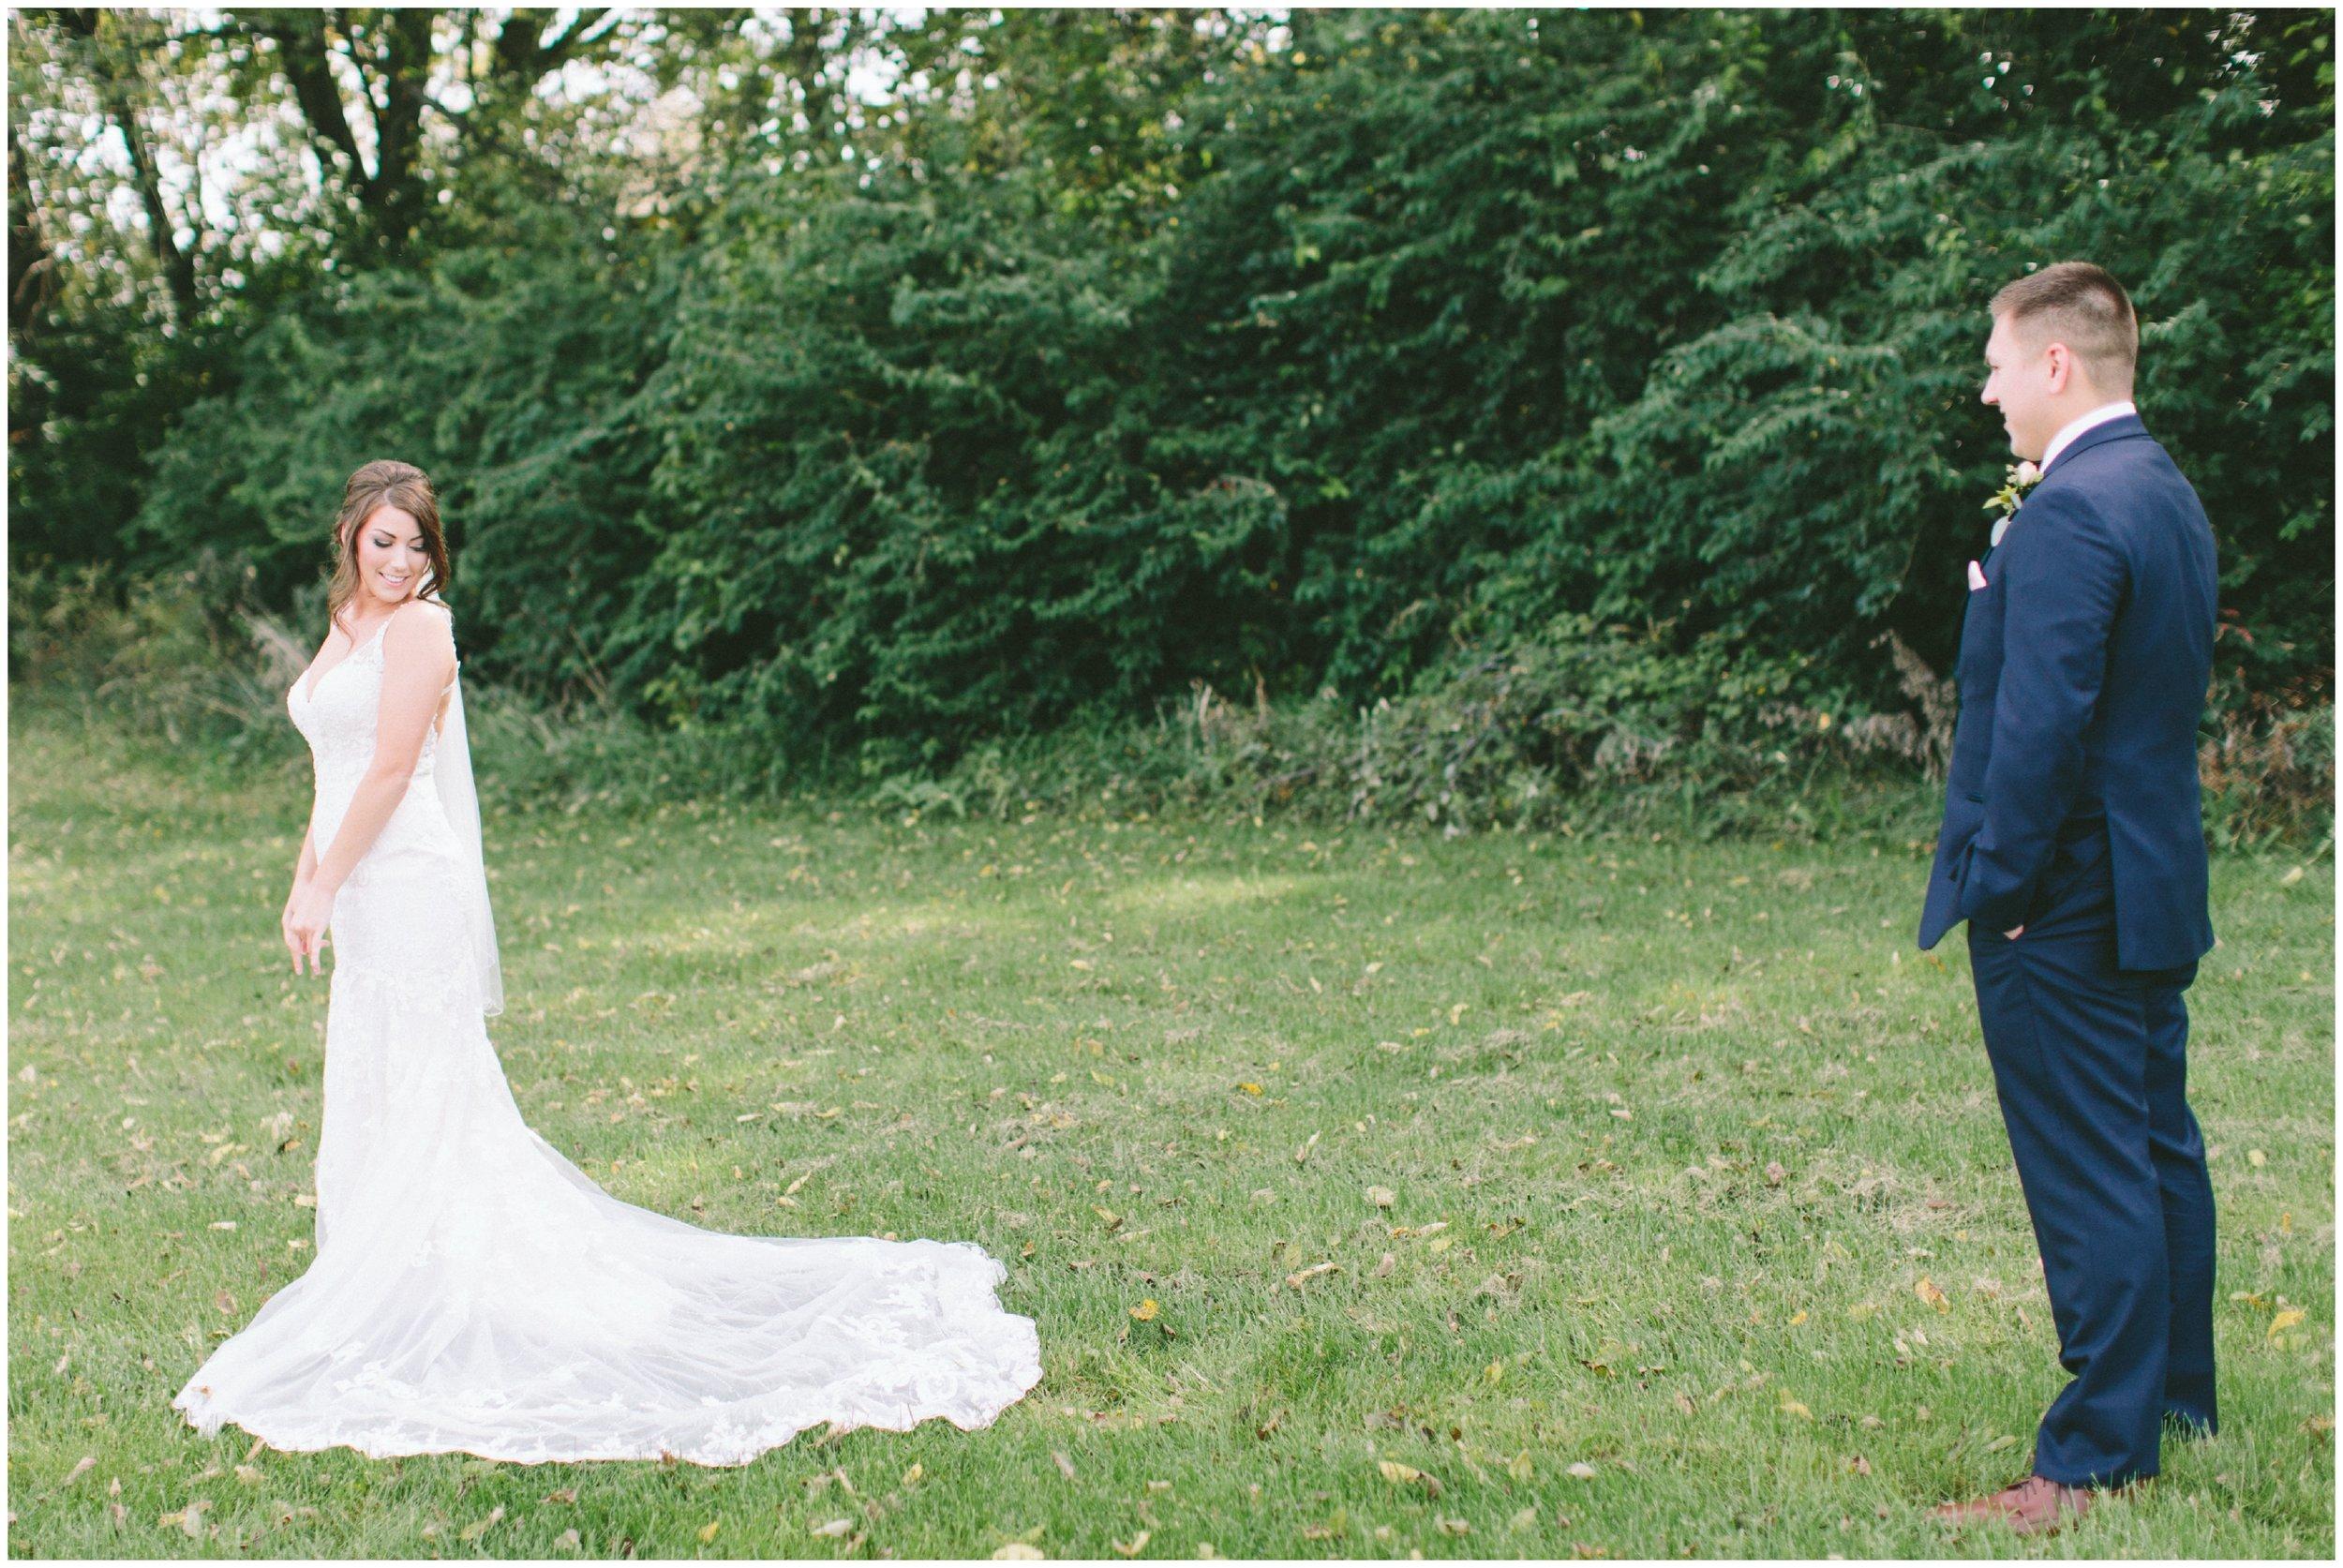 Indiana Wedding 22.JPG